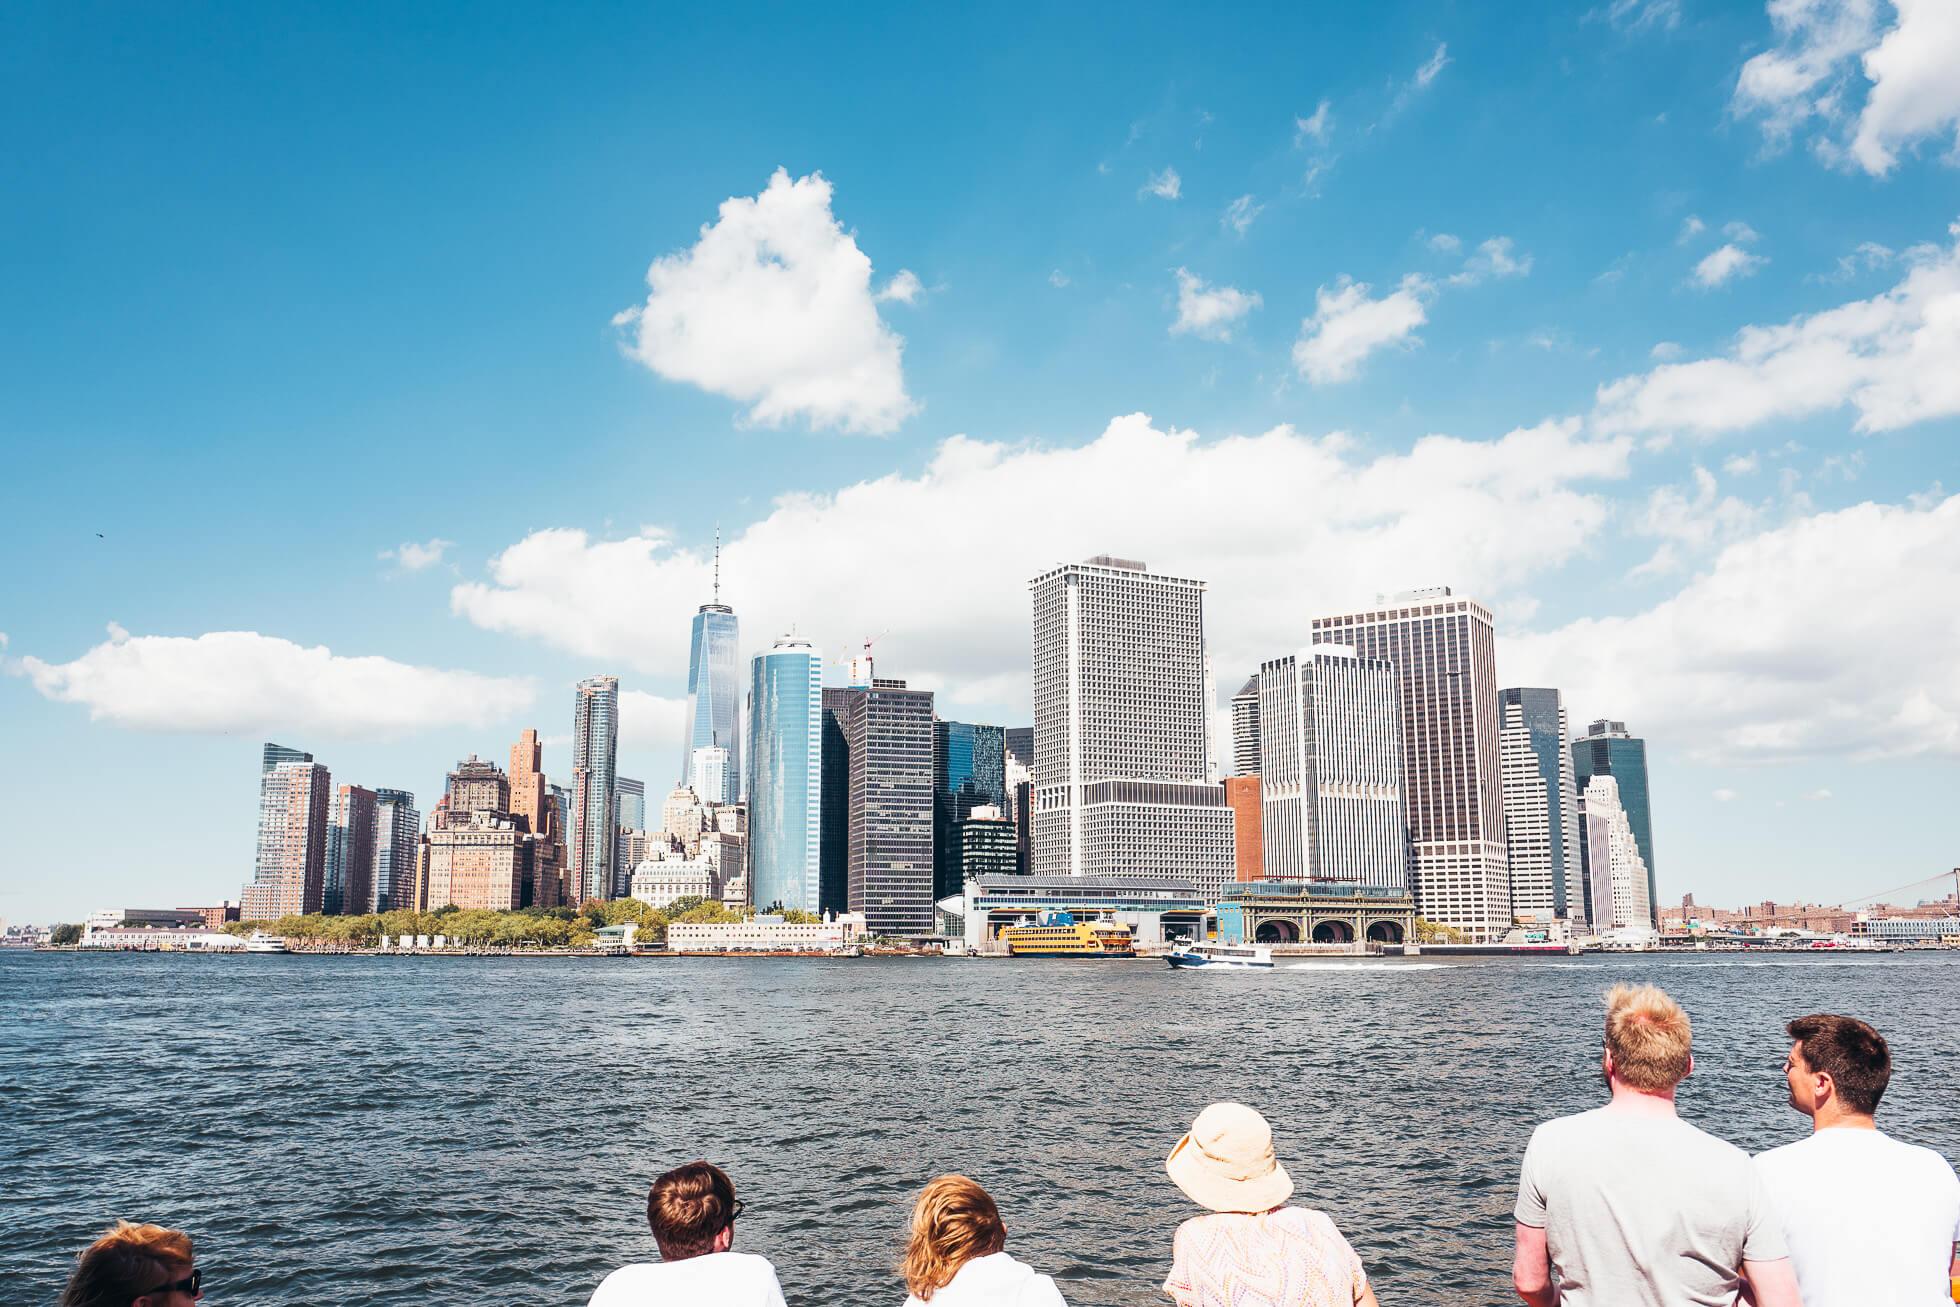 janni-deler-new-york-tour-boatL1090445